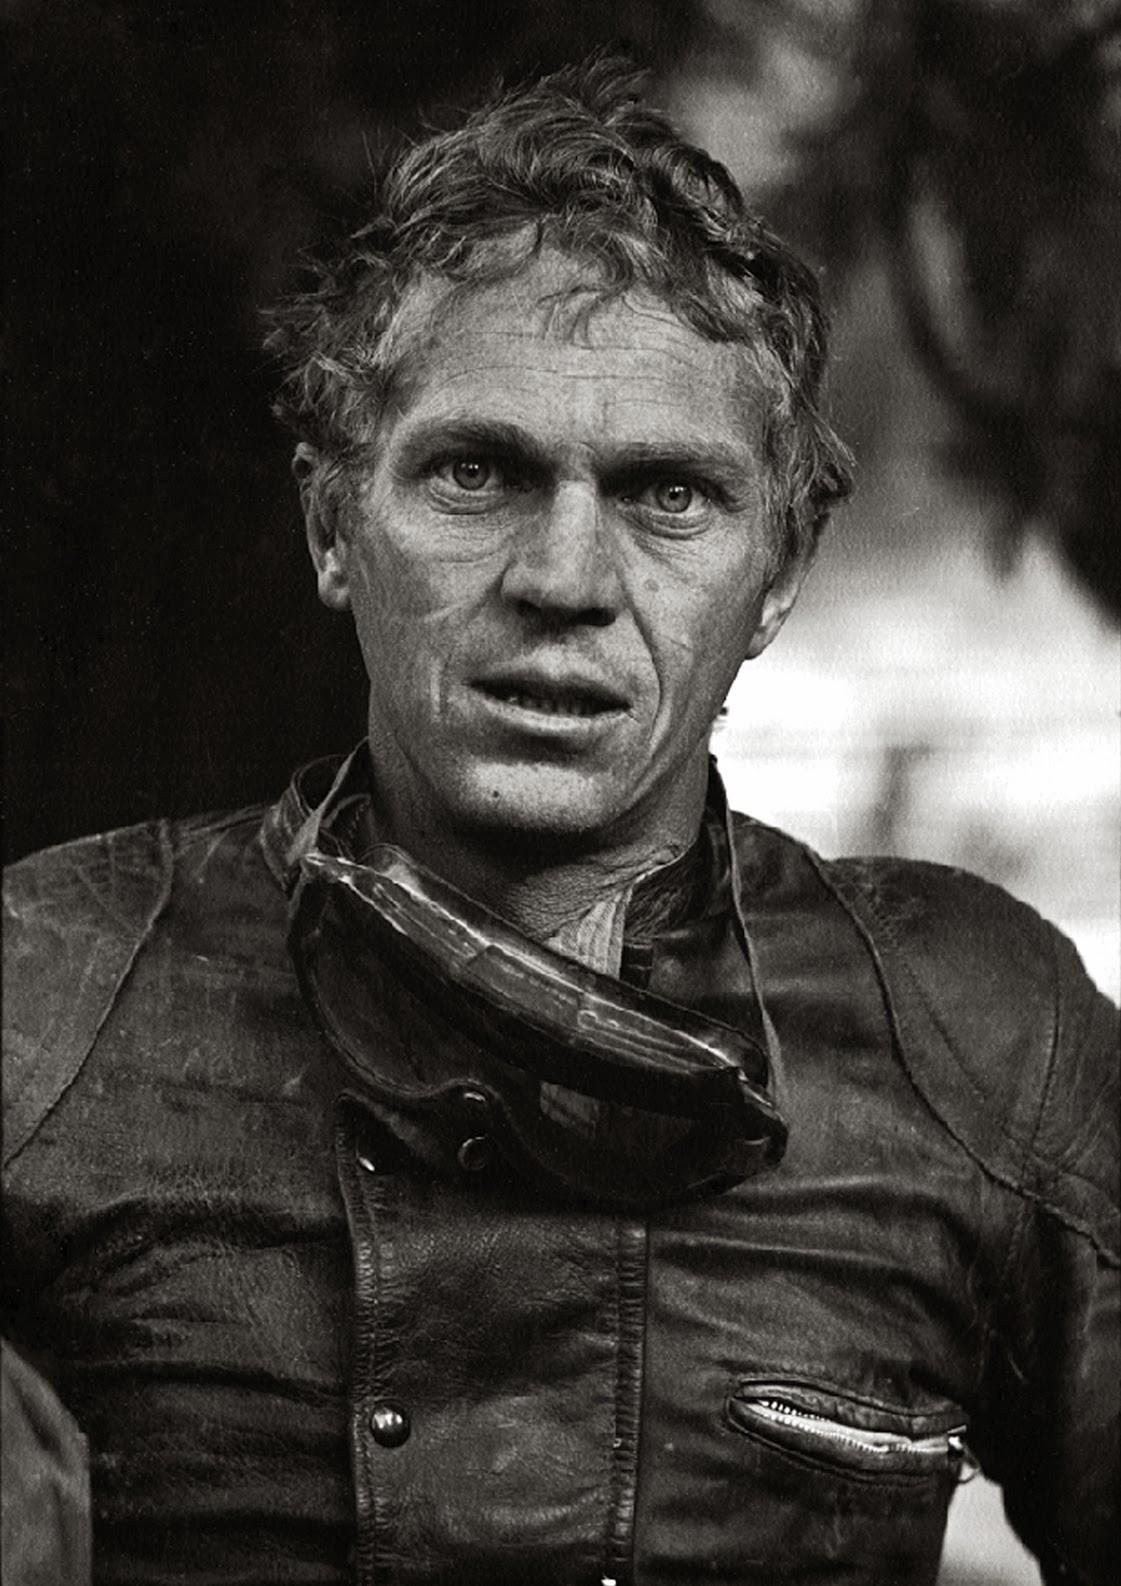 Steve McQueen in Lewis Leathers